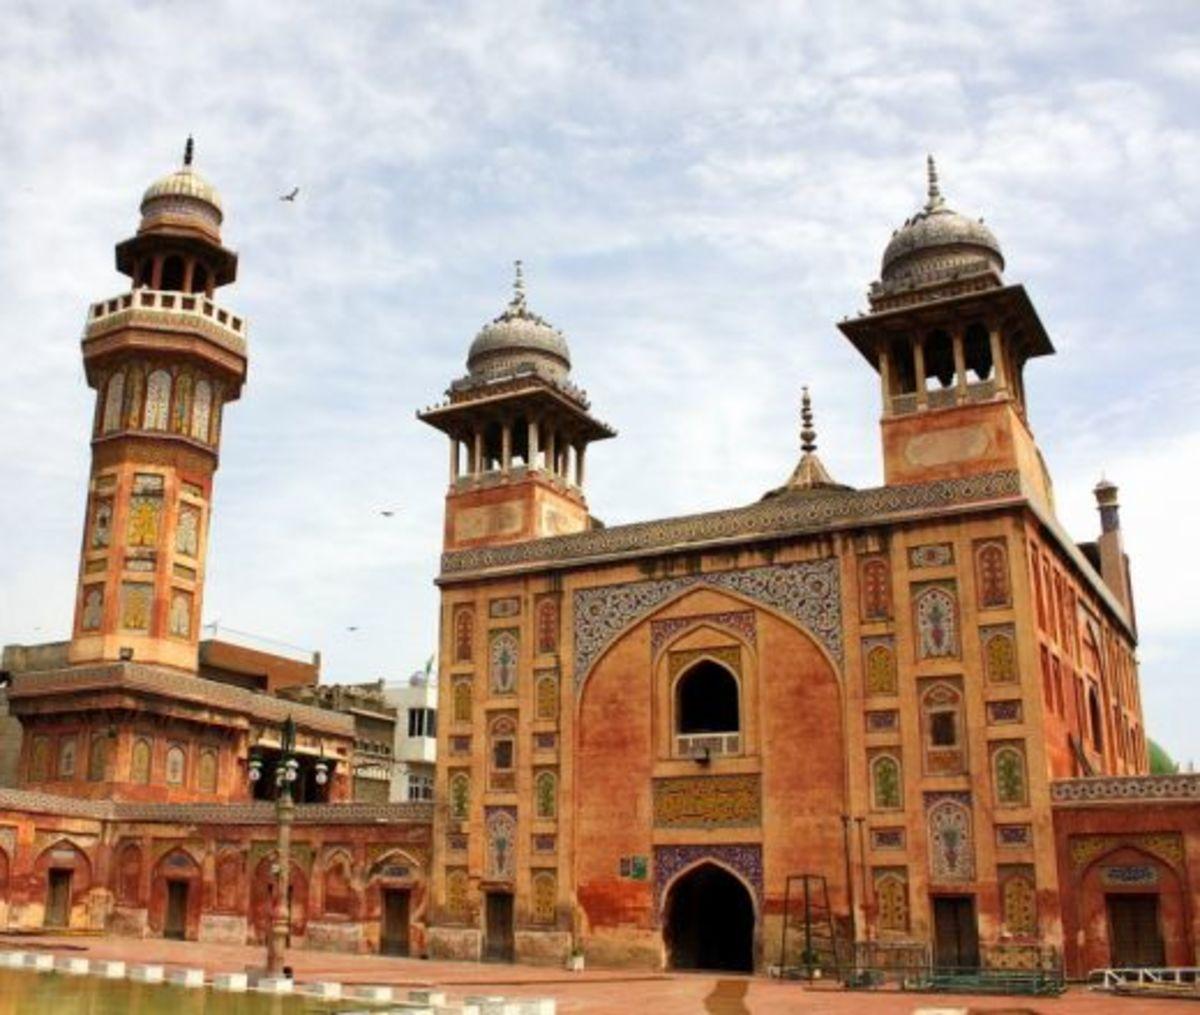 Built under mughal Shah Jahan's rule, 1634, Lahore.